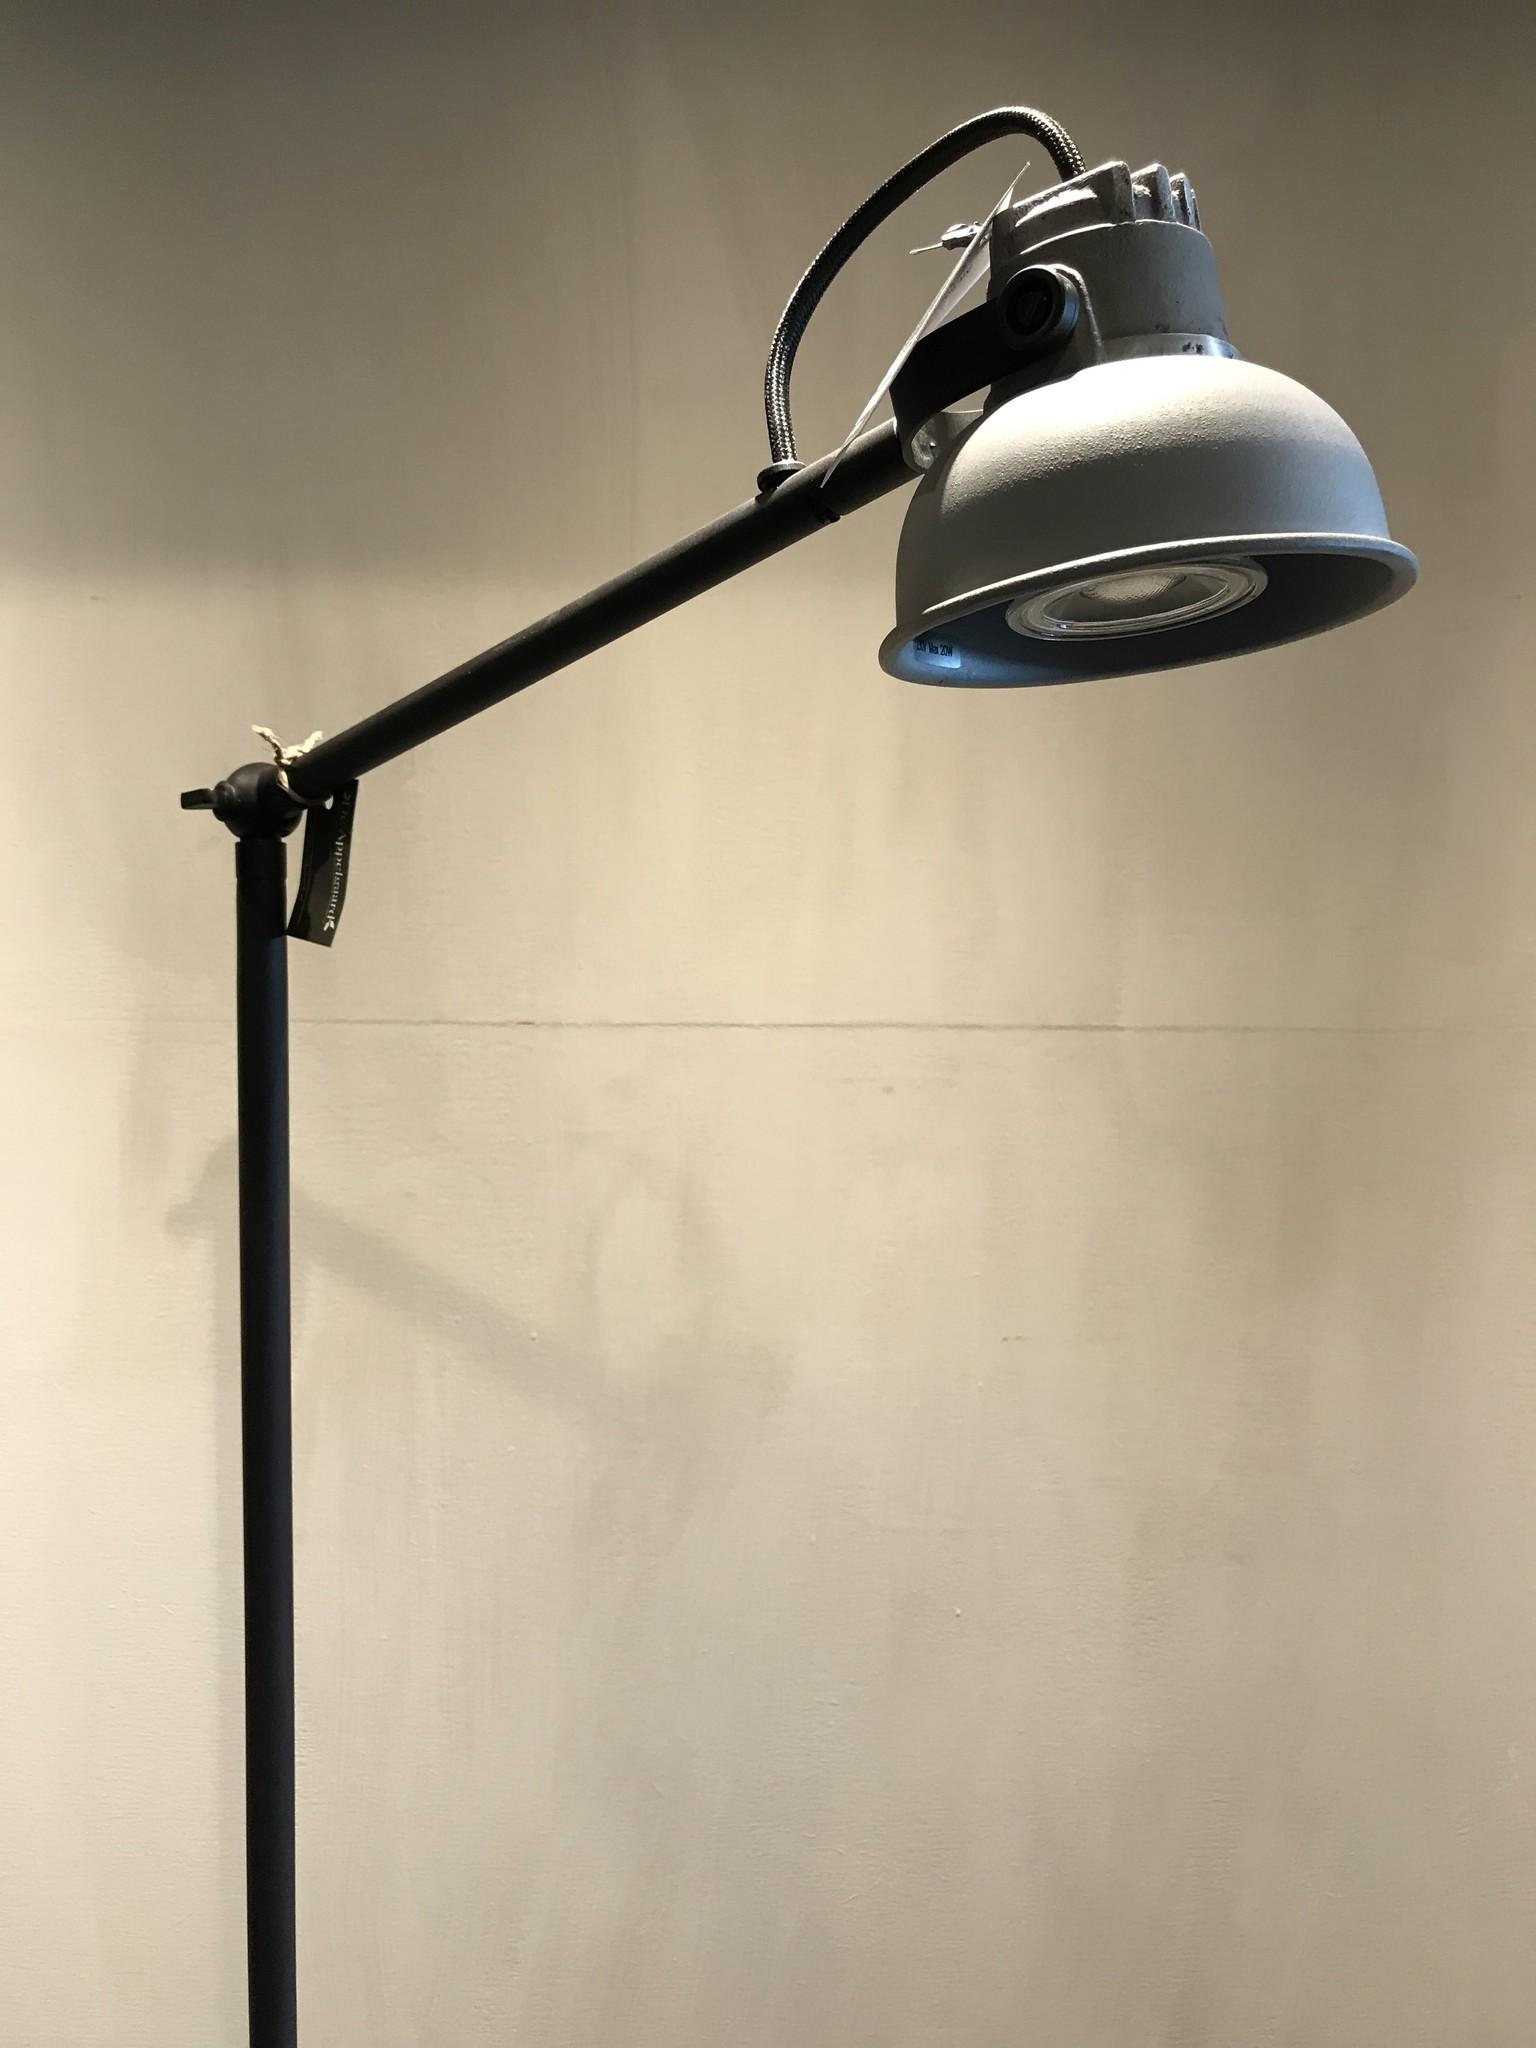 Frezoli Vloerlamp grijs pf zwart